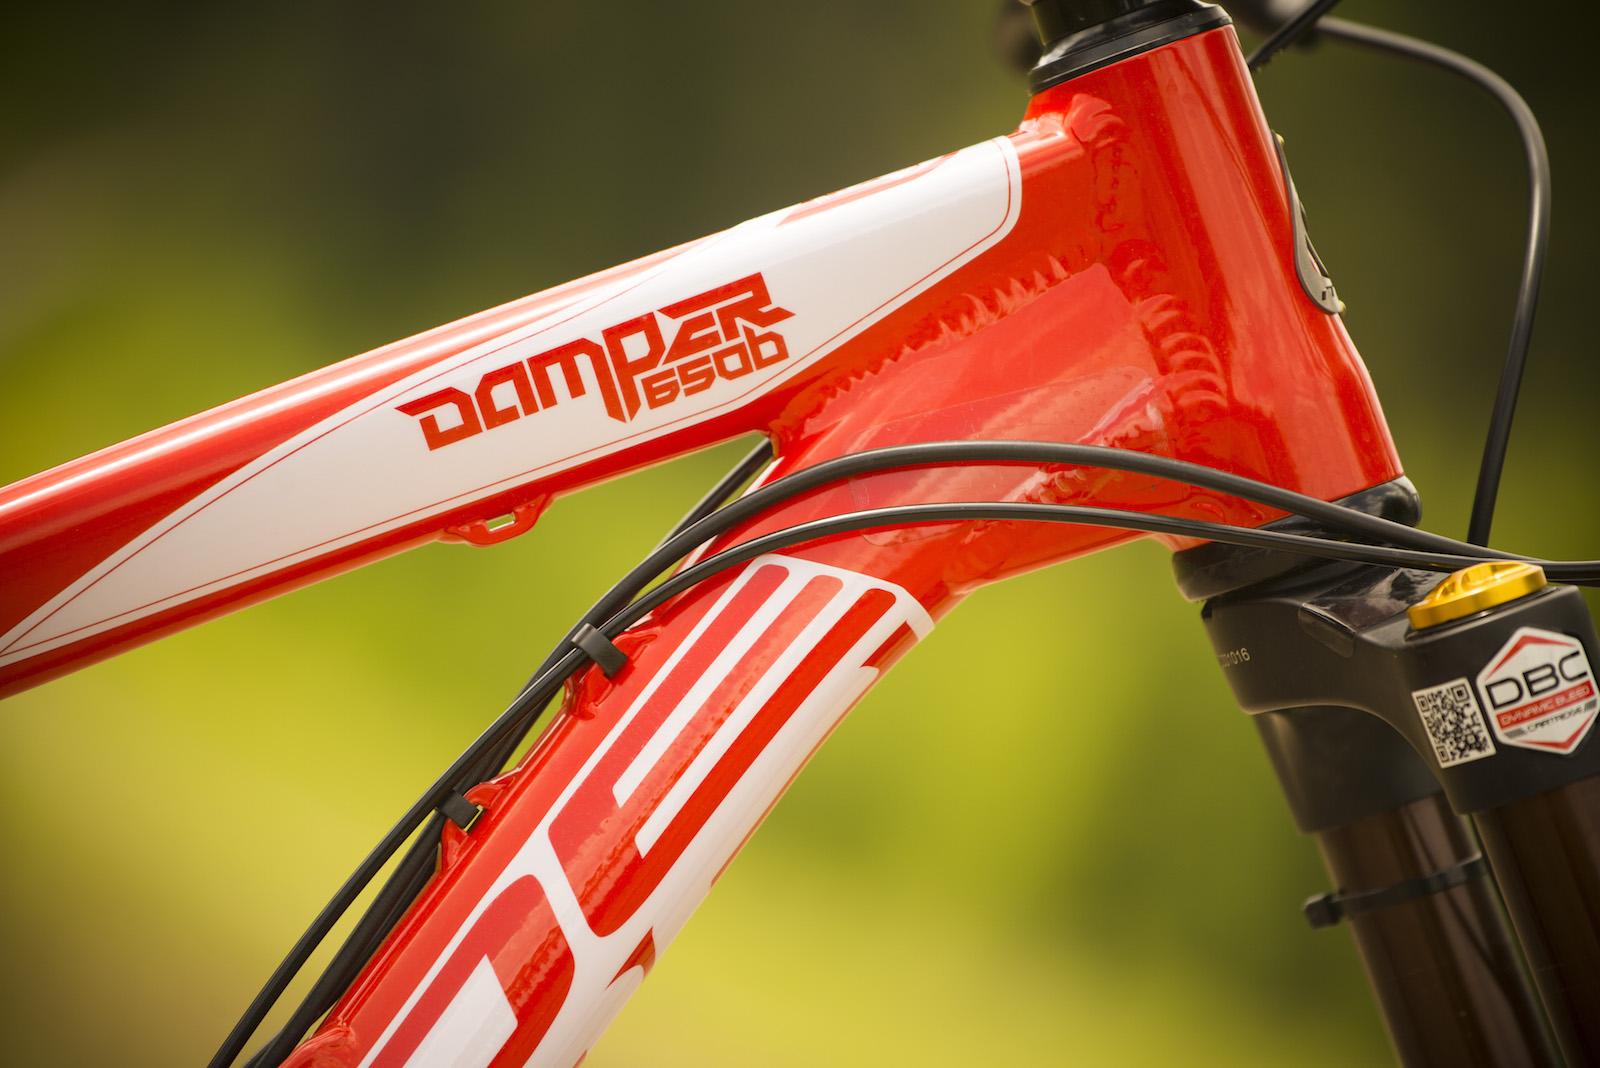 Damper650b_16_12